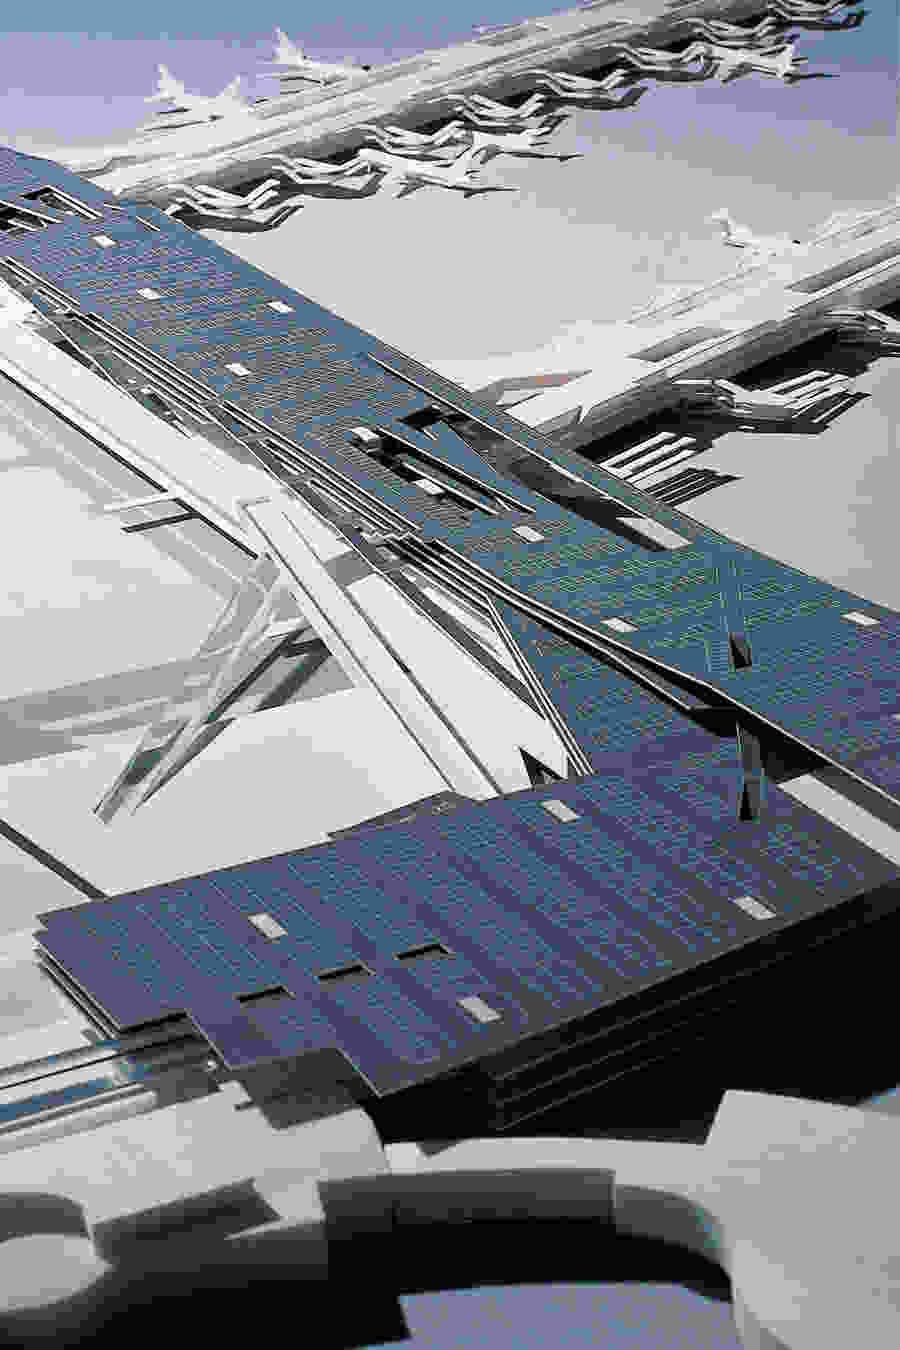 036 Vienna International Airport dm model 001